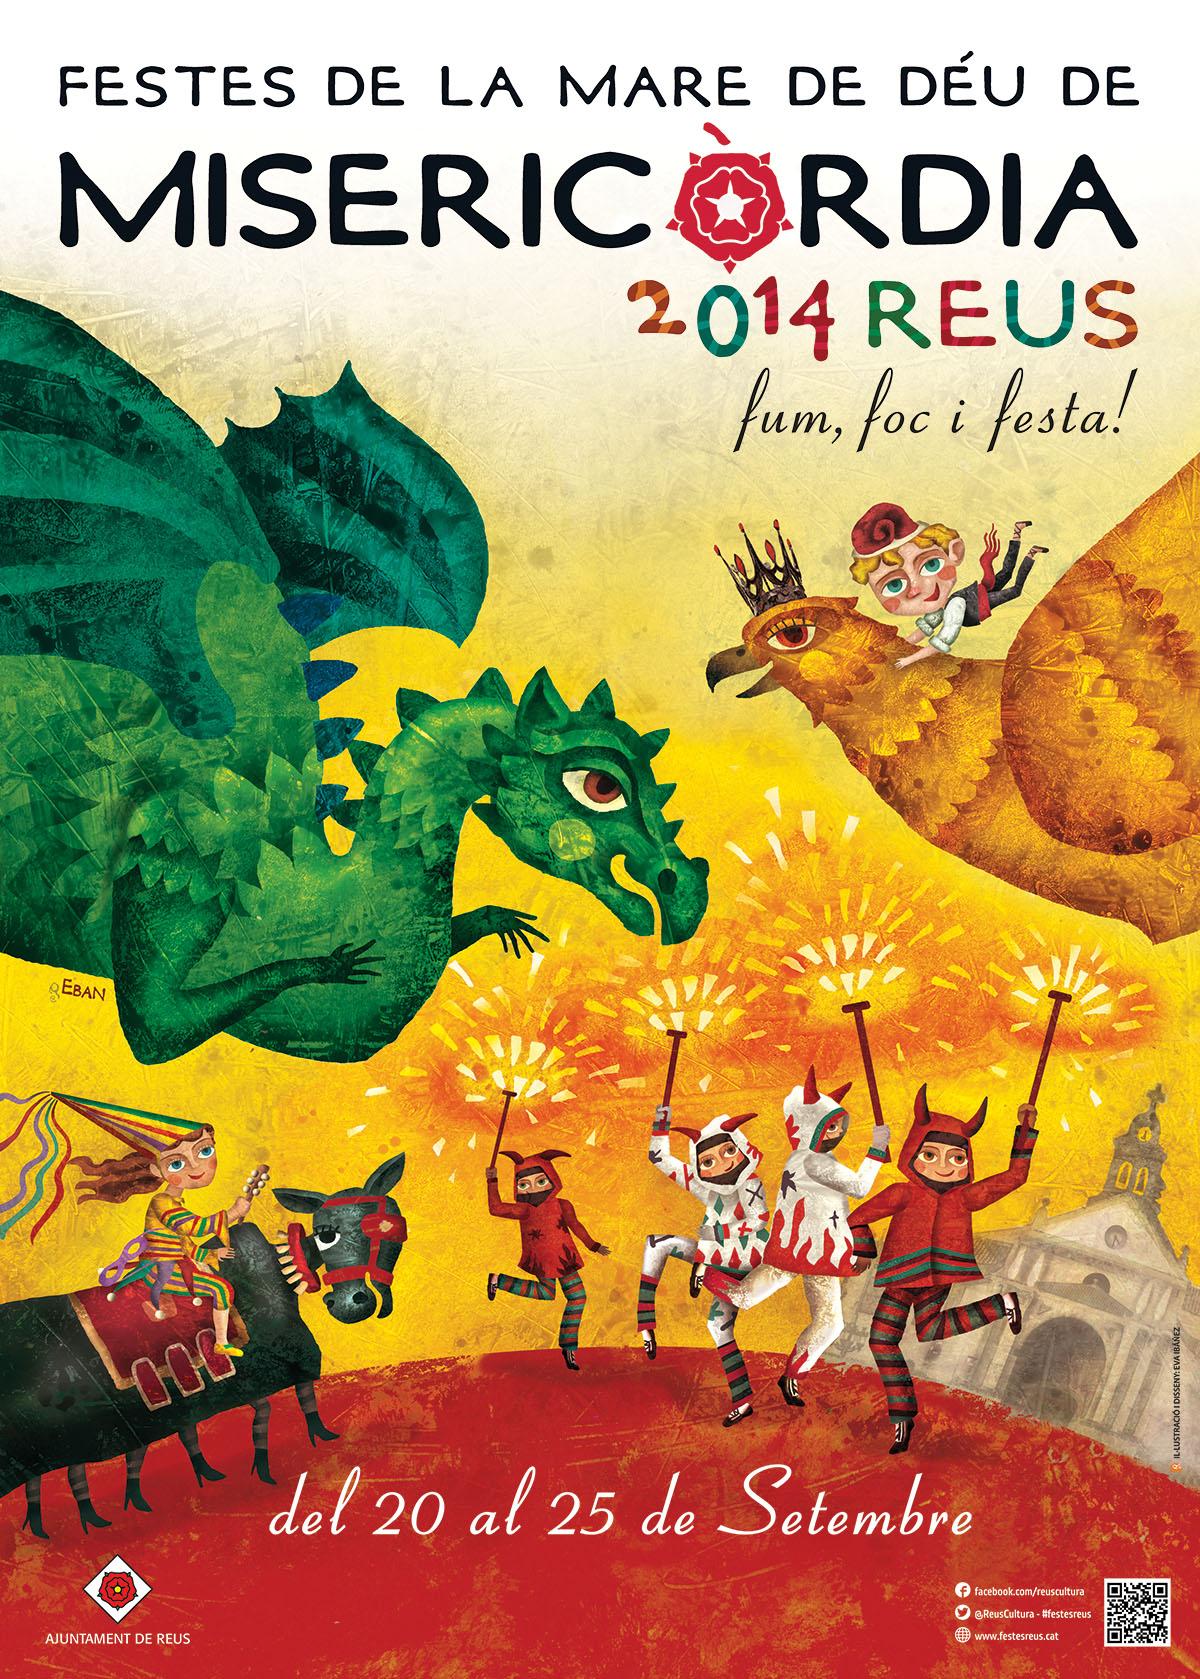 Diada castellera de Misericòrdia @ Plaça del Mercadal, Reus | Reus | Cataluña | España